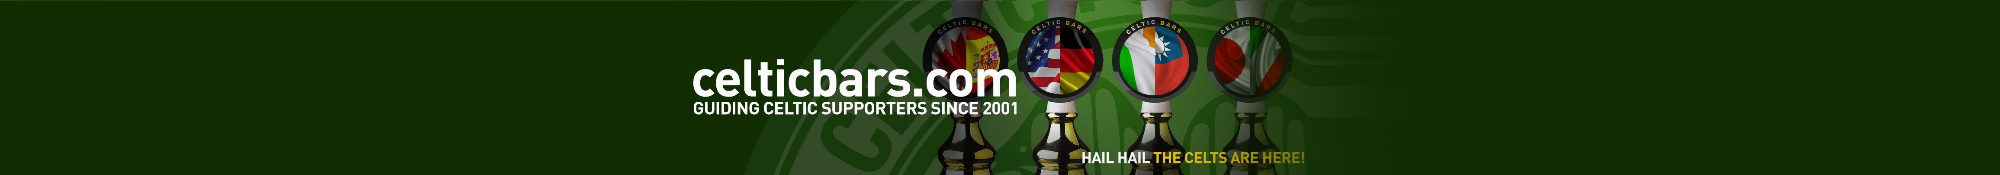 CelticBars.com